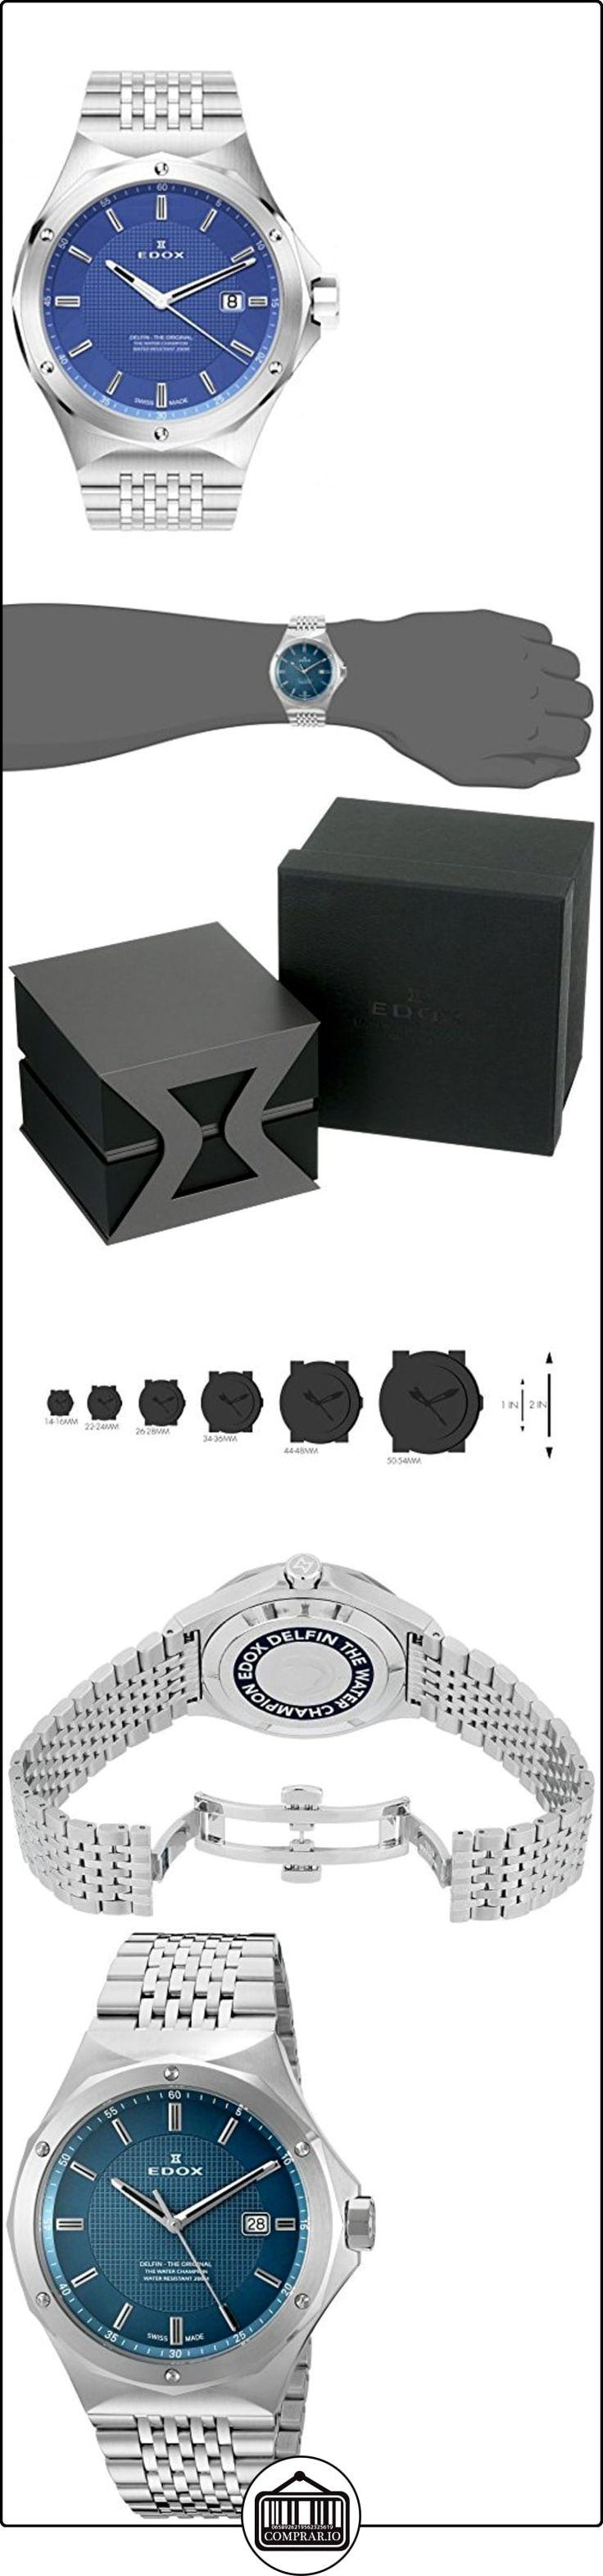 EDOX hombre 53005-3M BUIN Delfin Analógica Swiss plateado de cuarzo reloj  ✿ Relojes para hombre - (Lujo) ✿ ▬► Ver oferta: http://comprar.io/goto/B00ZIODTWO